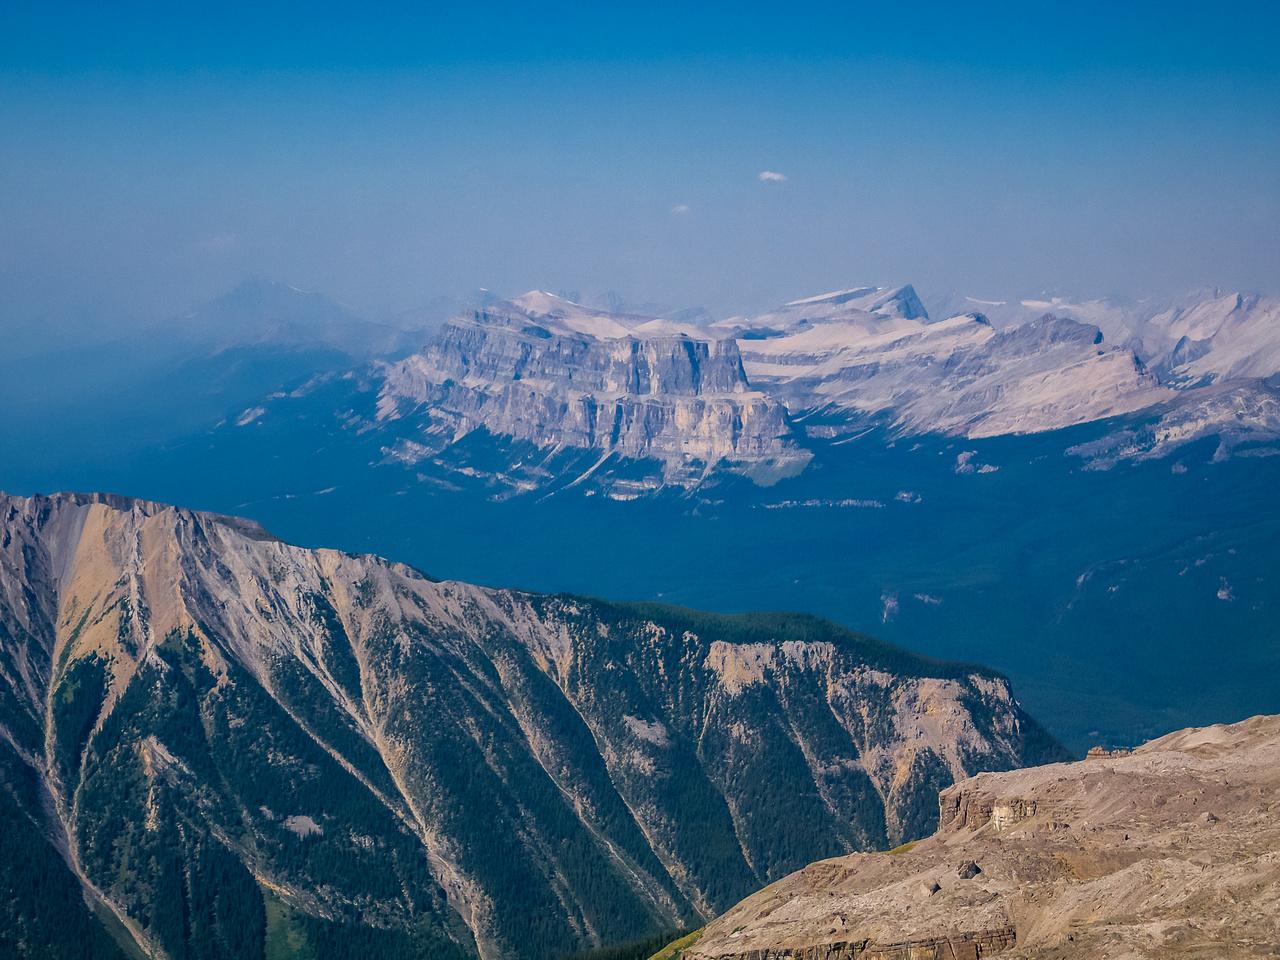 The Castle Mountain massif.